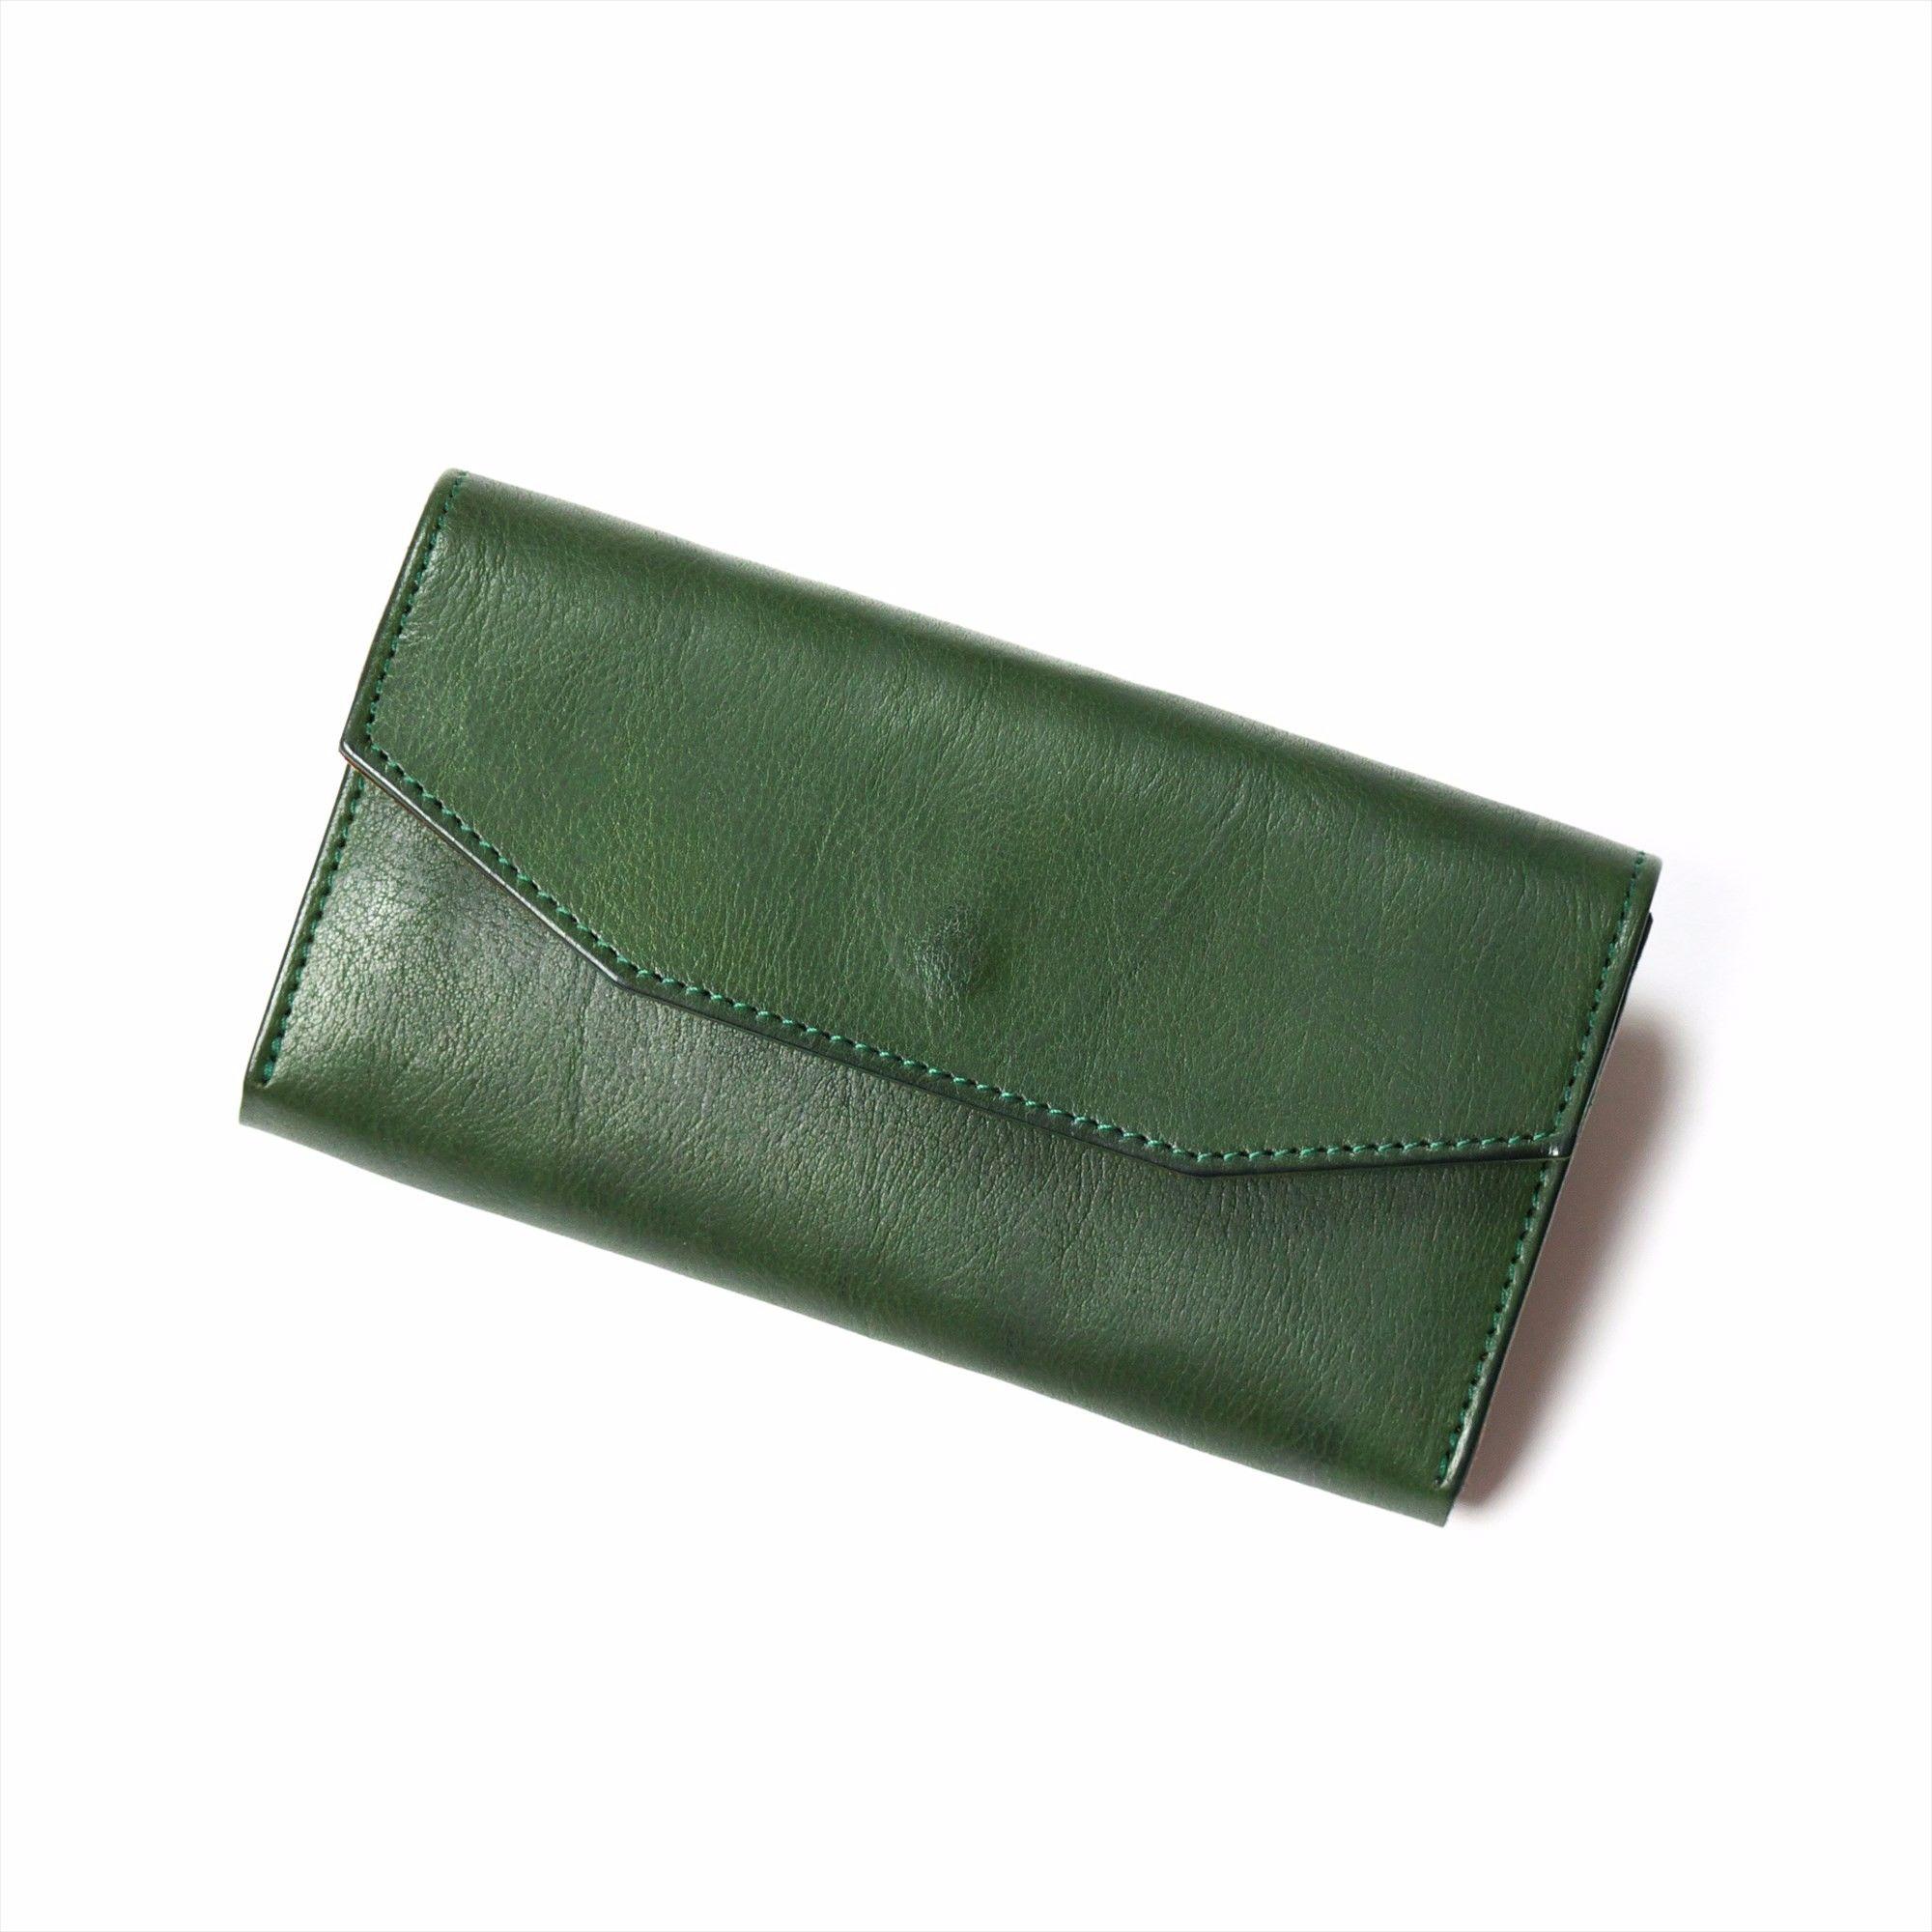 ANNAK ギャルソン型長財布 配色タイプ グリーン×ベージュ AK14TA-B0039